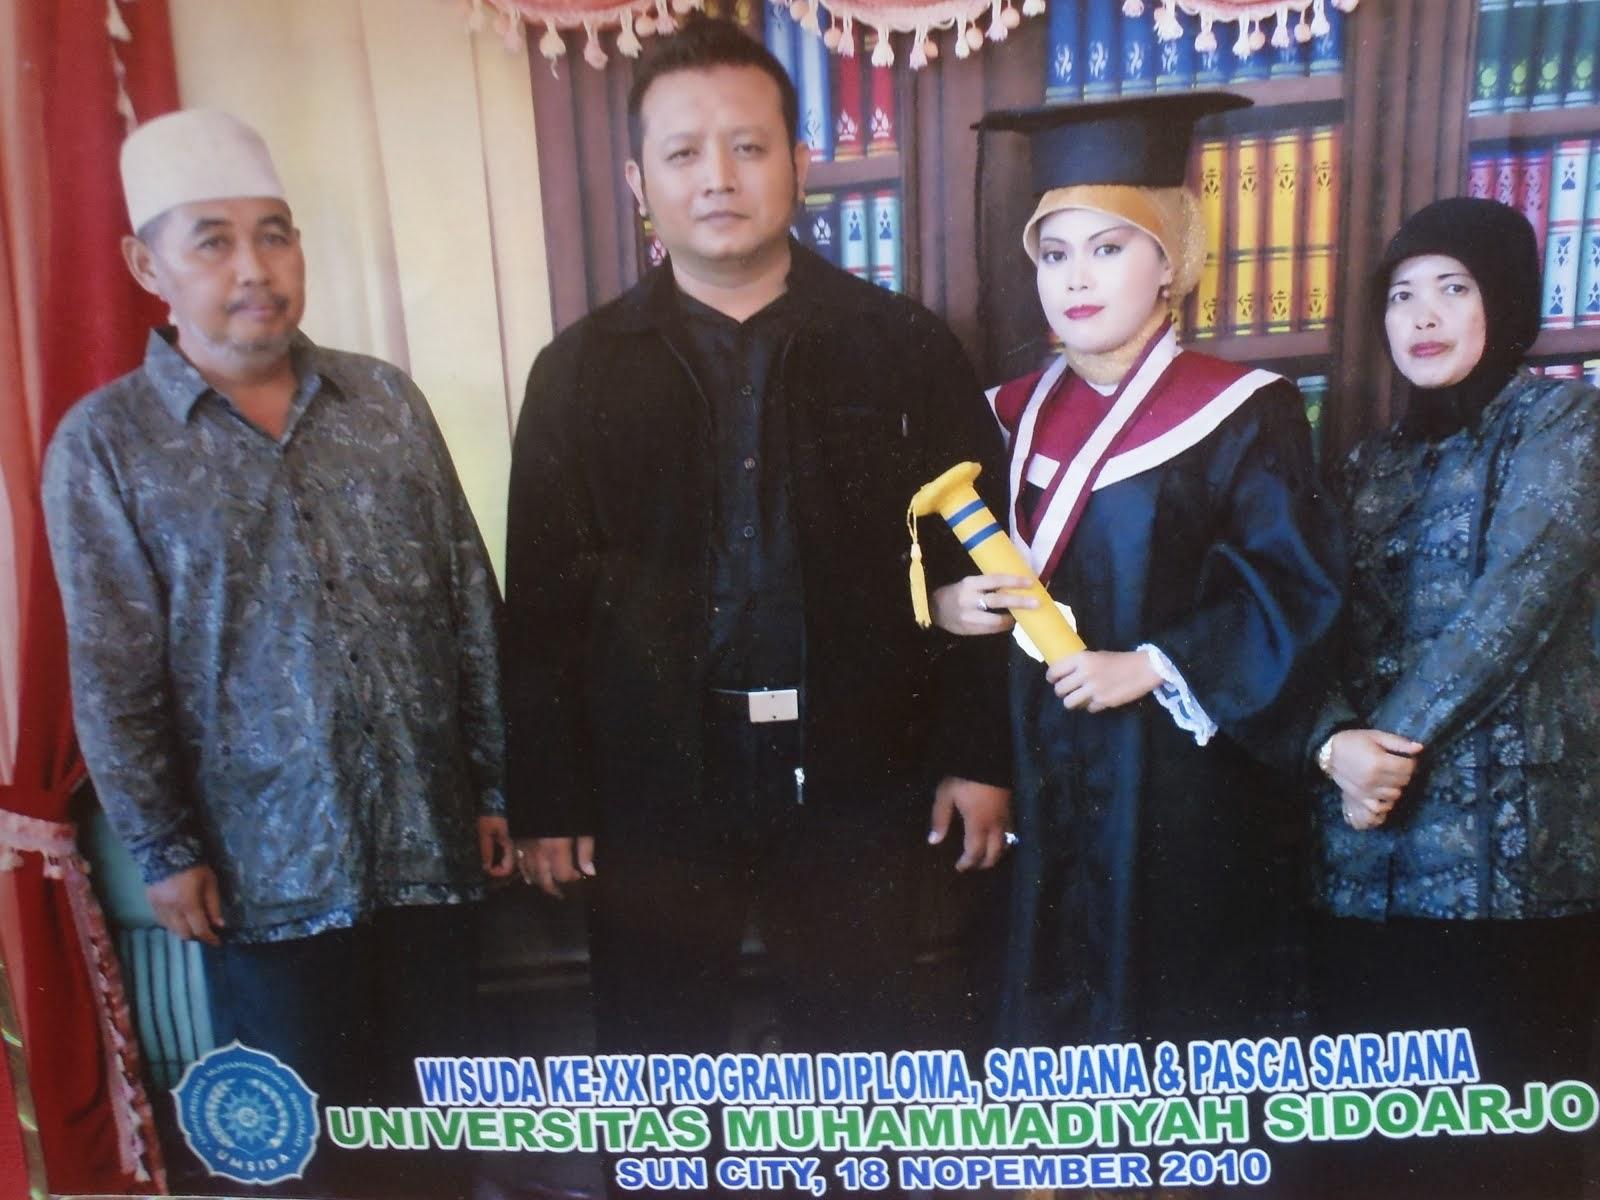 Wisuda Strata Satu Istriku diUniversitas Muhammadiyah Sidoarjo